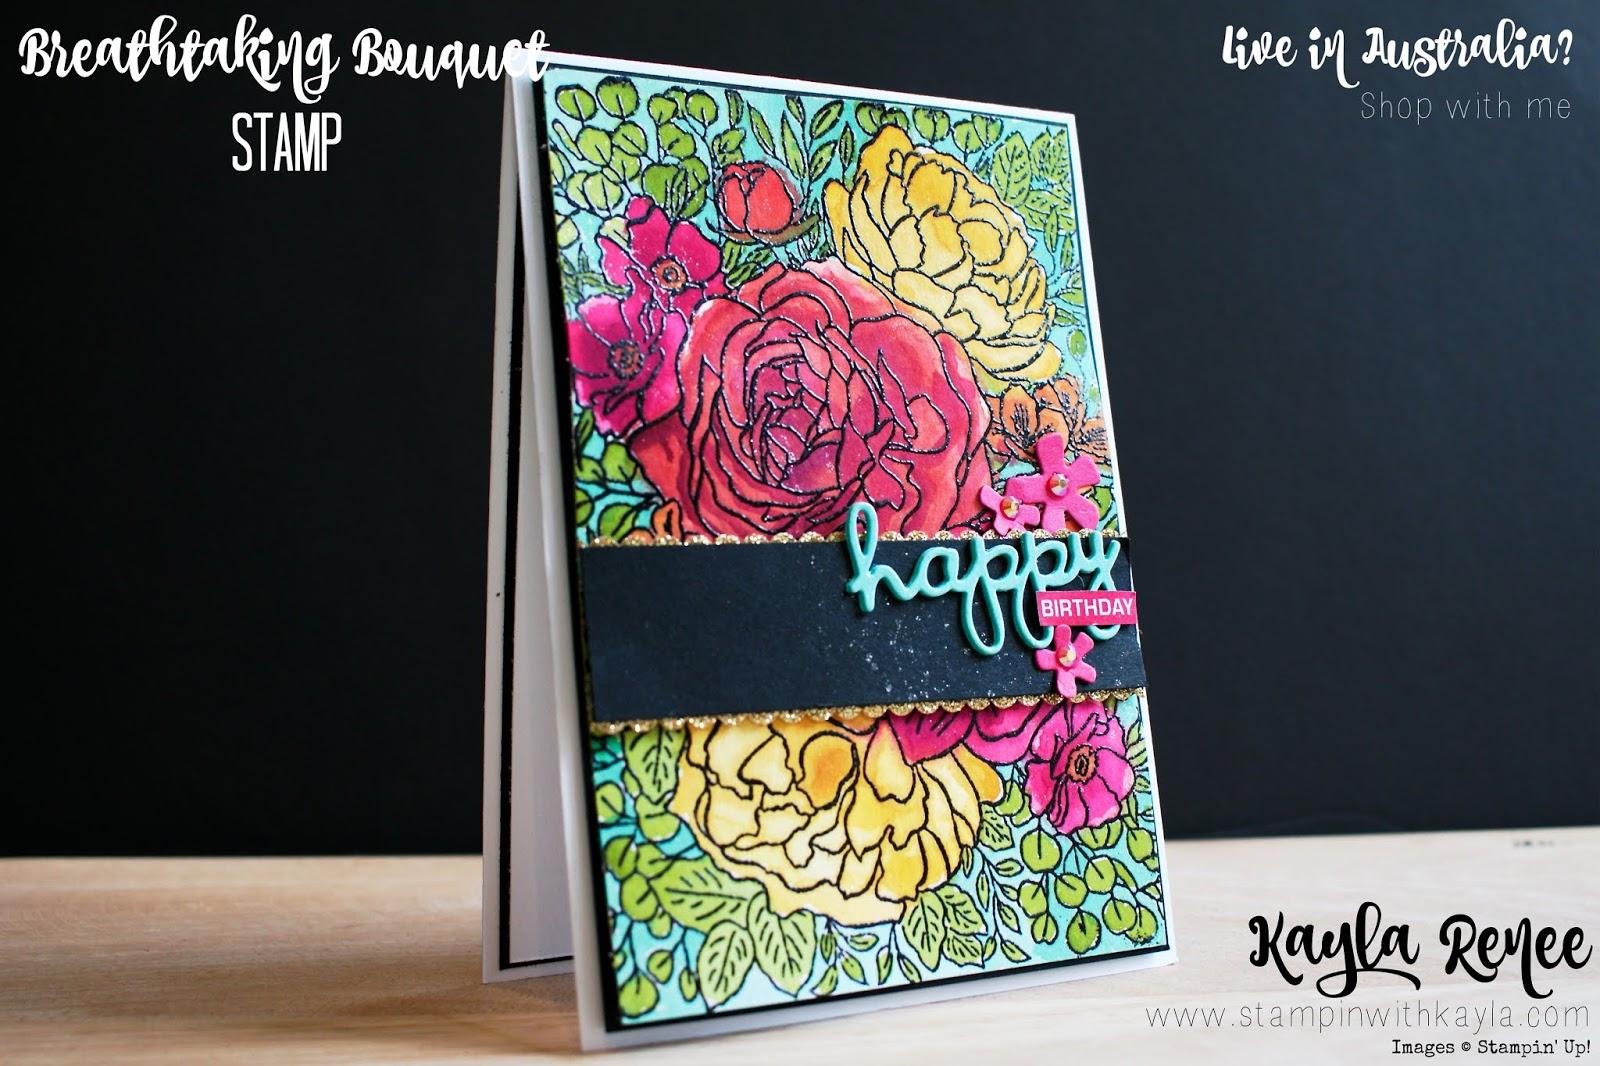 Breathtaking Bouquet ~ Happy Birthday Card